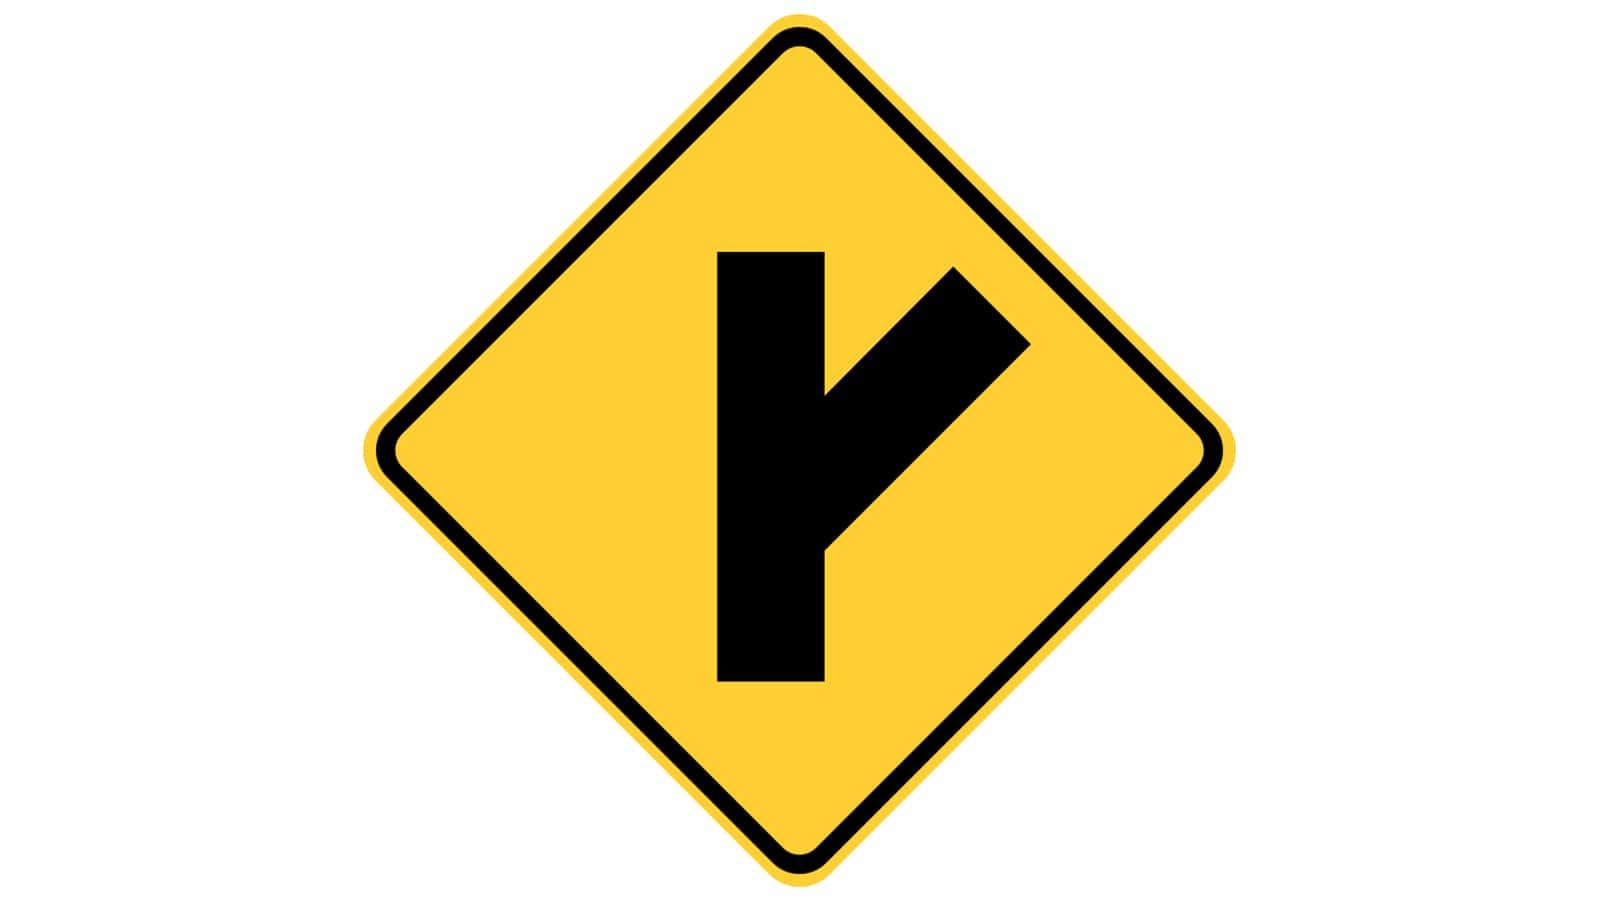 Warning sign Side Road at Acute Angle